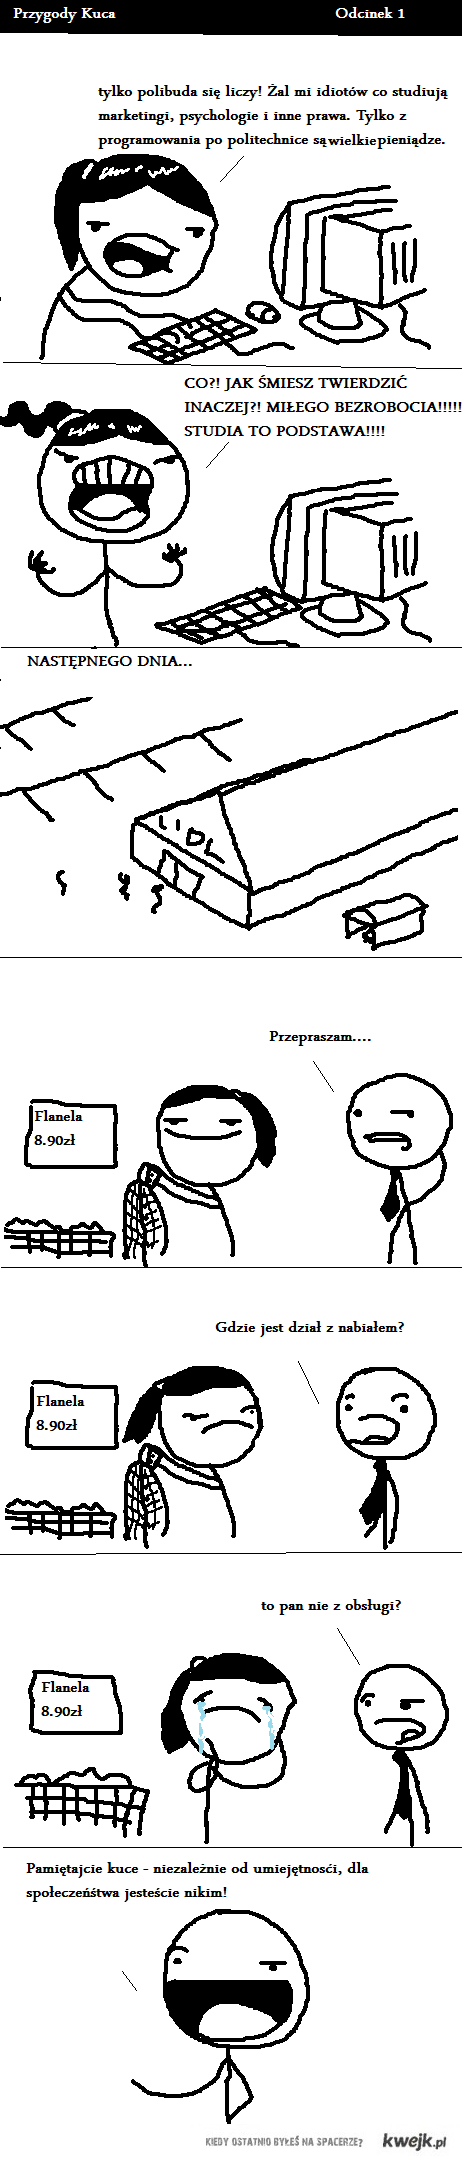 Przygody kuca z politechniki